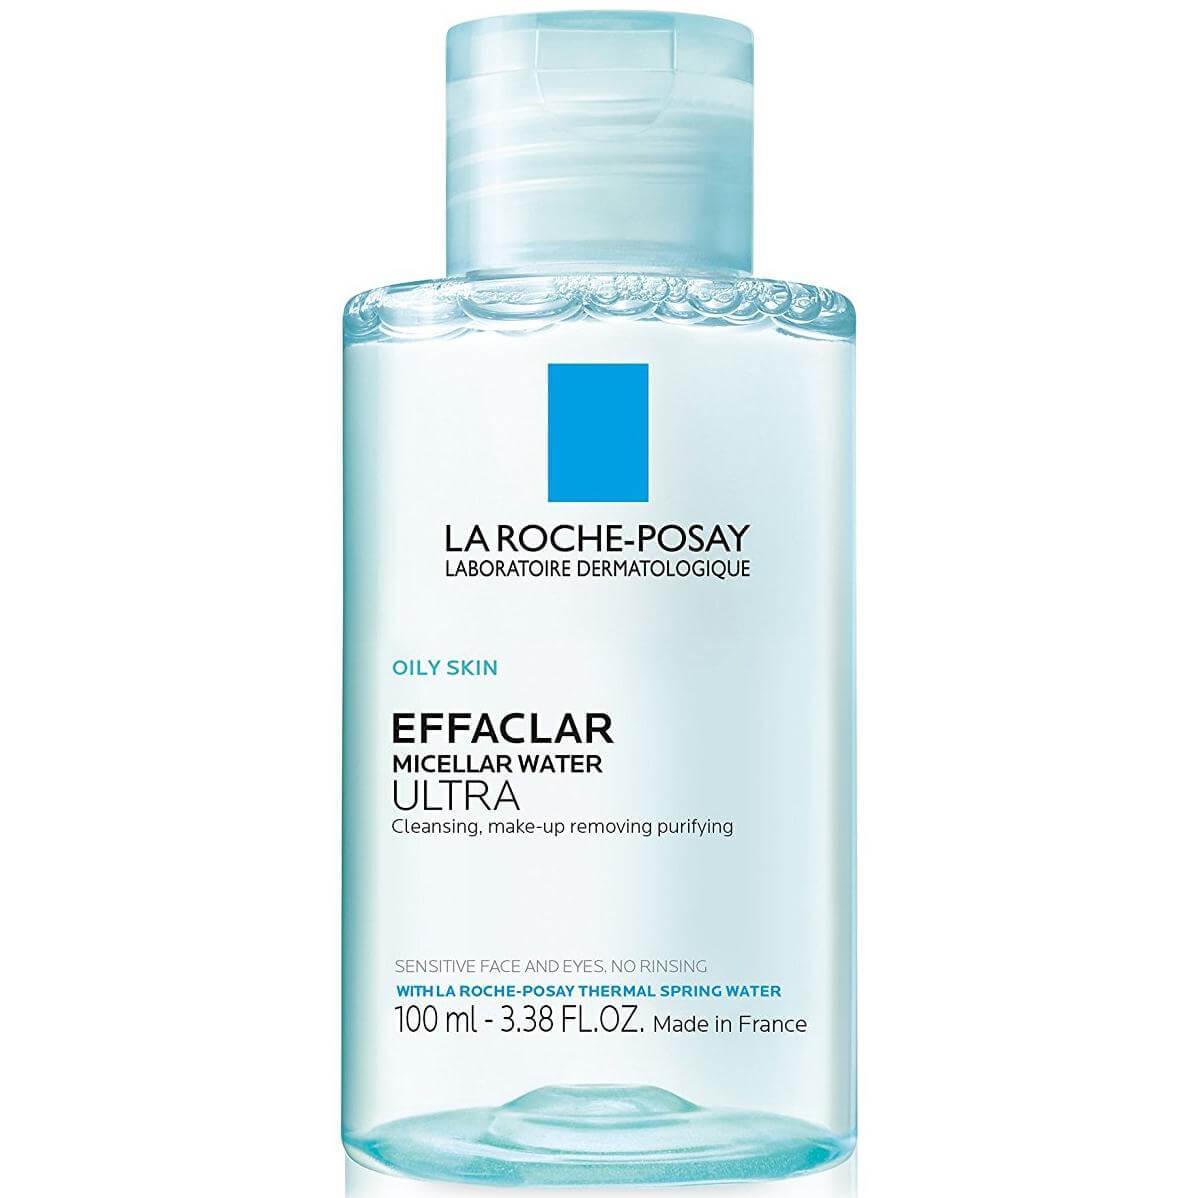 La Roche Posay Effaclar Micellar Water Ultra Απαλό Νερό Καθαρισμού Προσώπου Ματιών για το Λιπαρό Δέρμα Travel Size 100ml